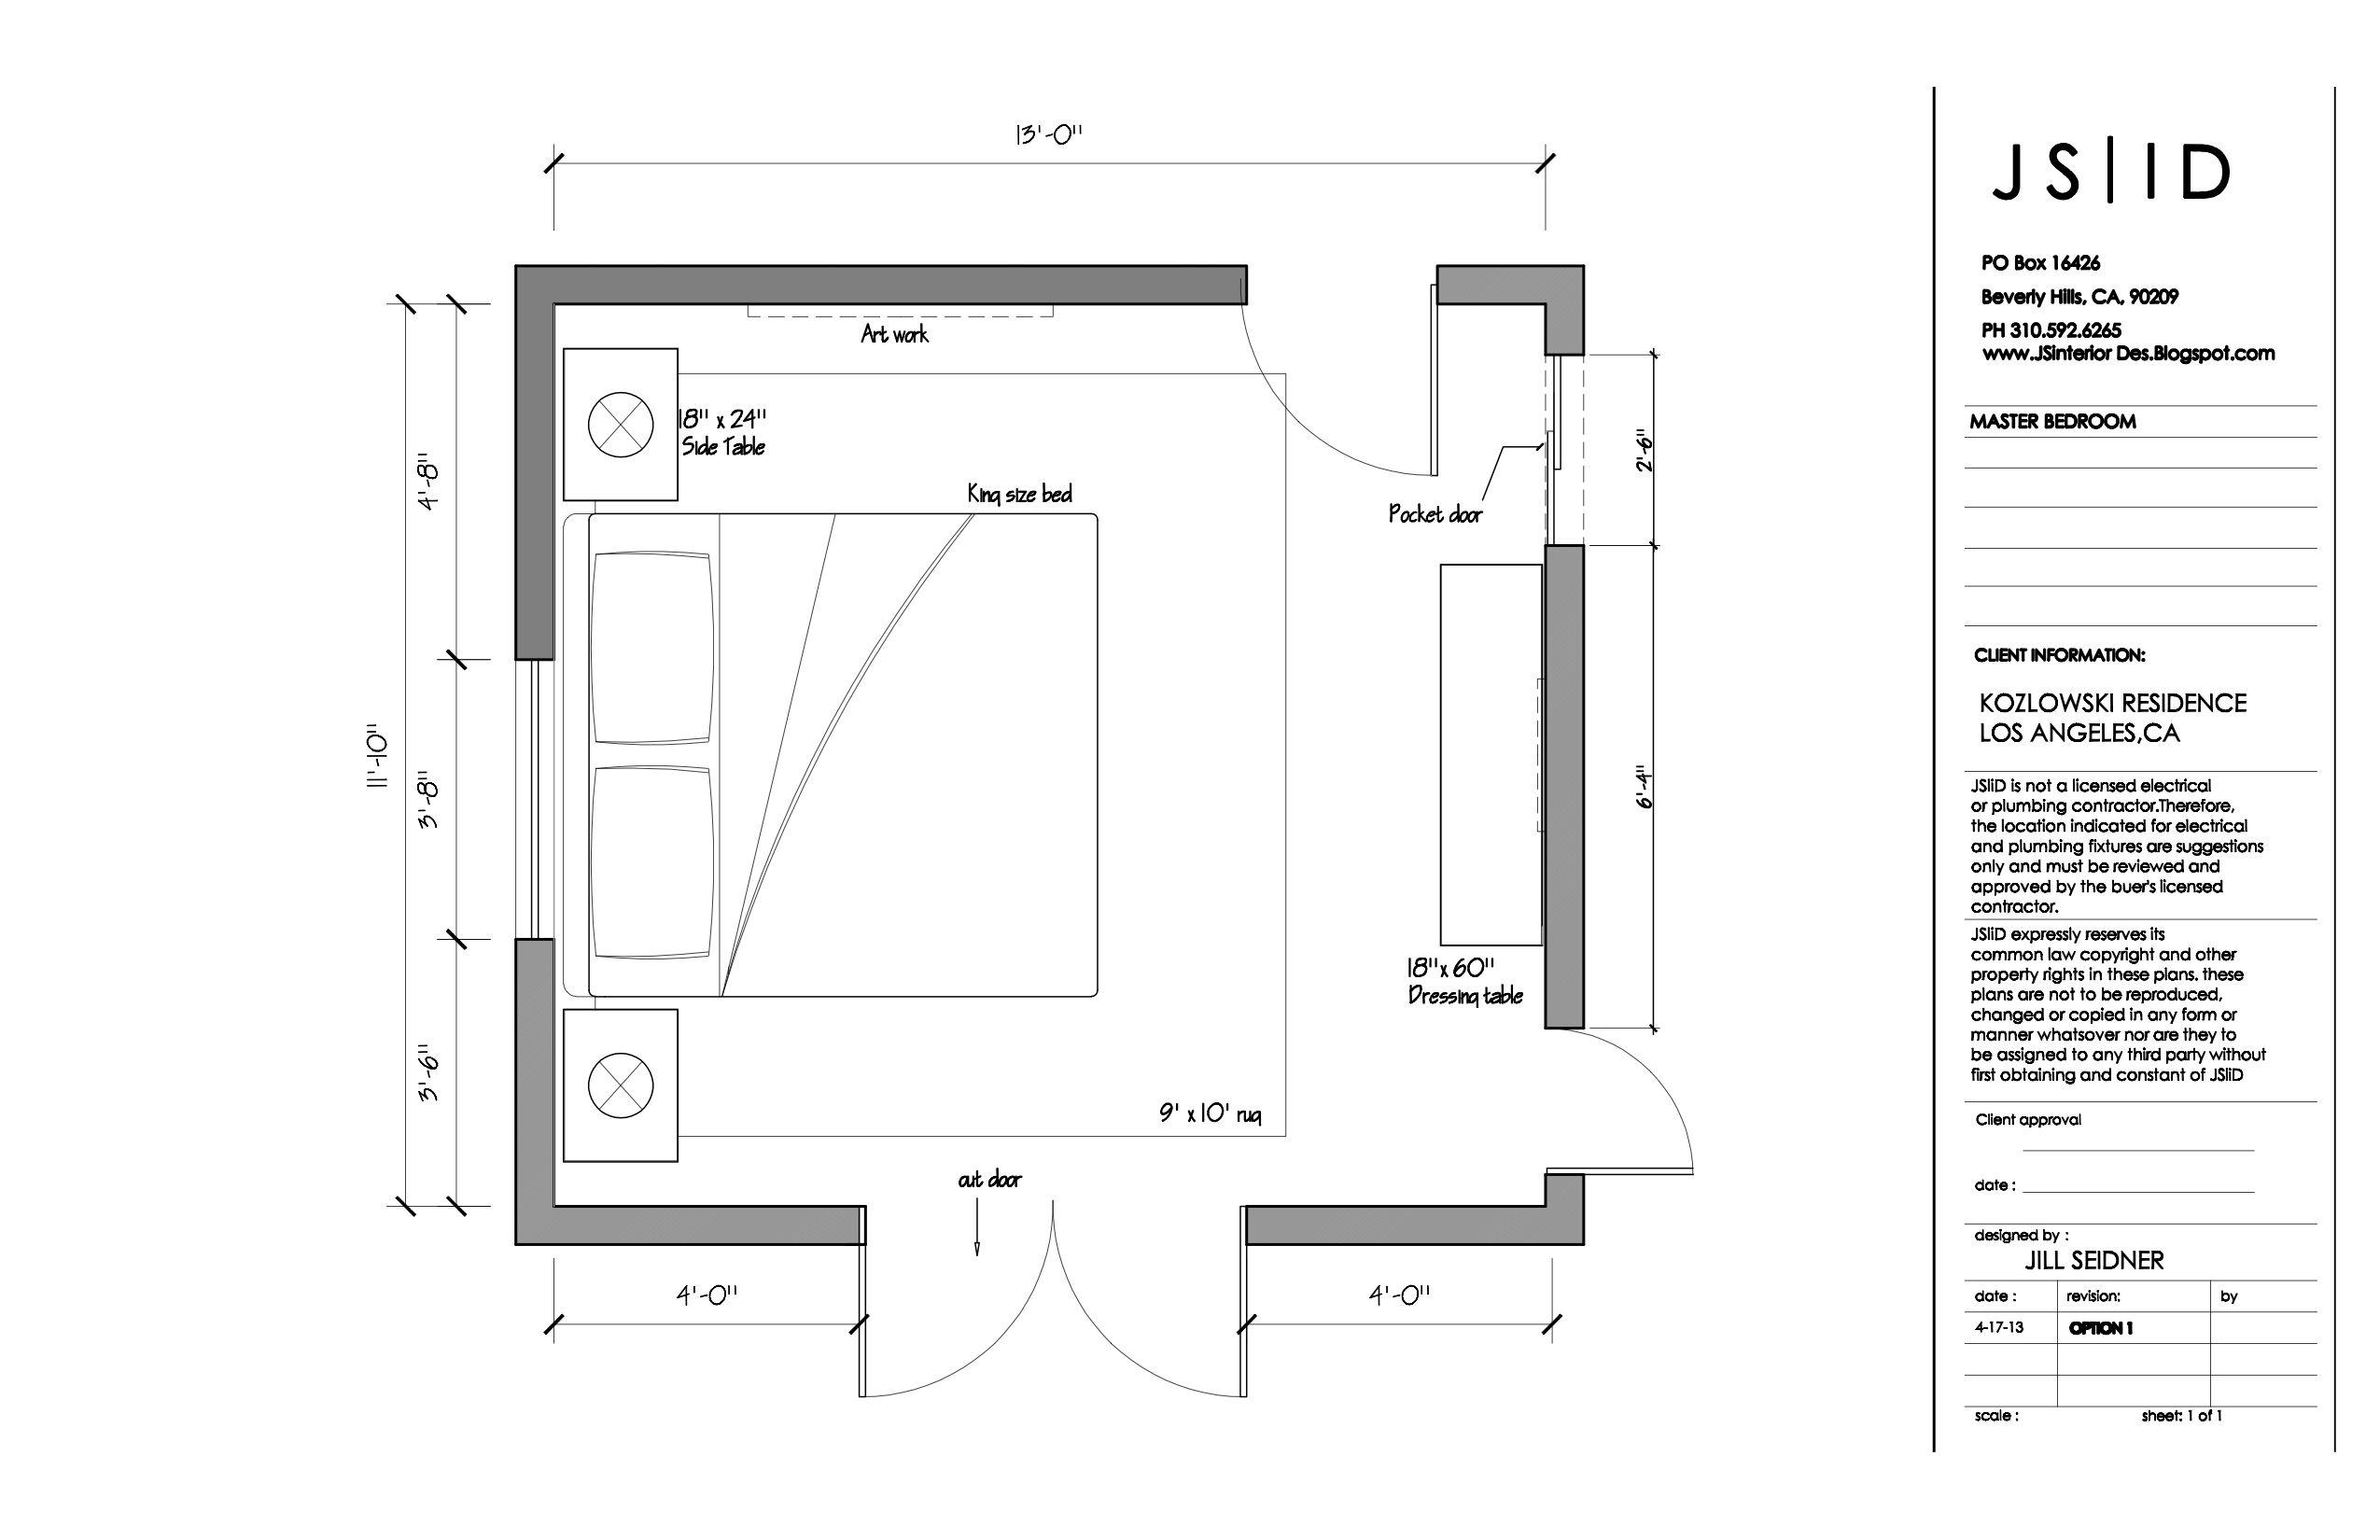 los angeles craftsman house master bedroom furniture floor plan los angeles craftsman house master bedroom furniture floor plan layout cad by jayani ranasinghe for